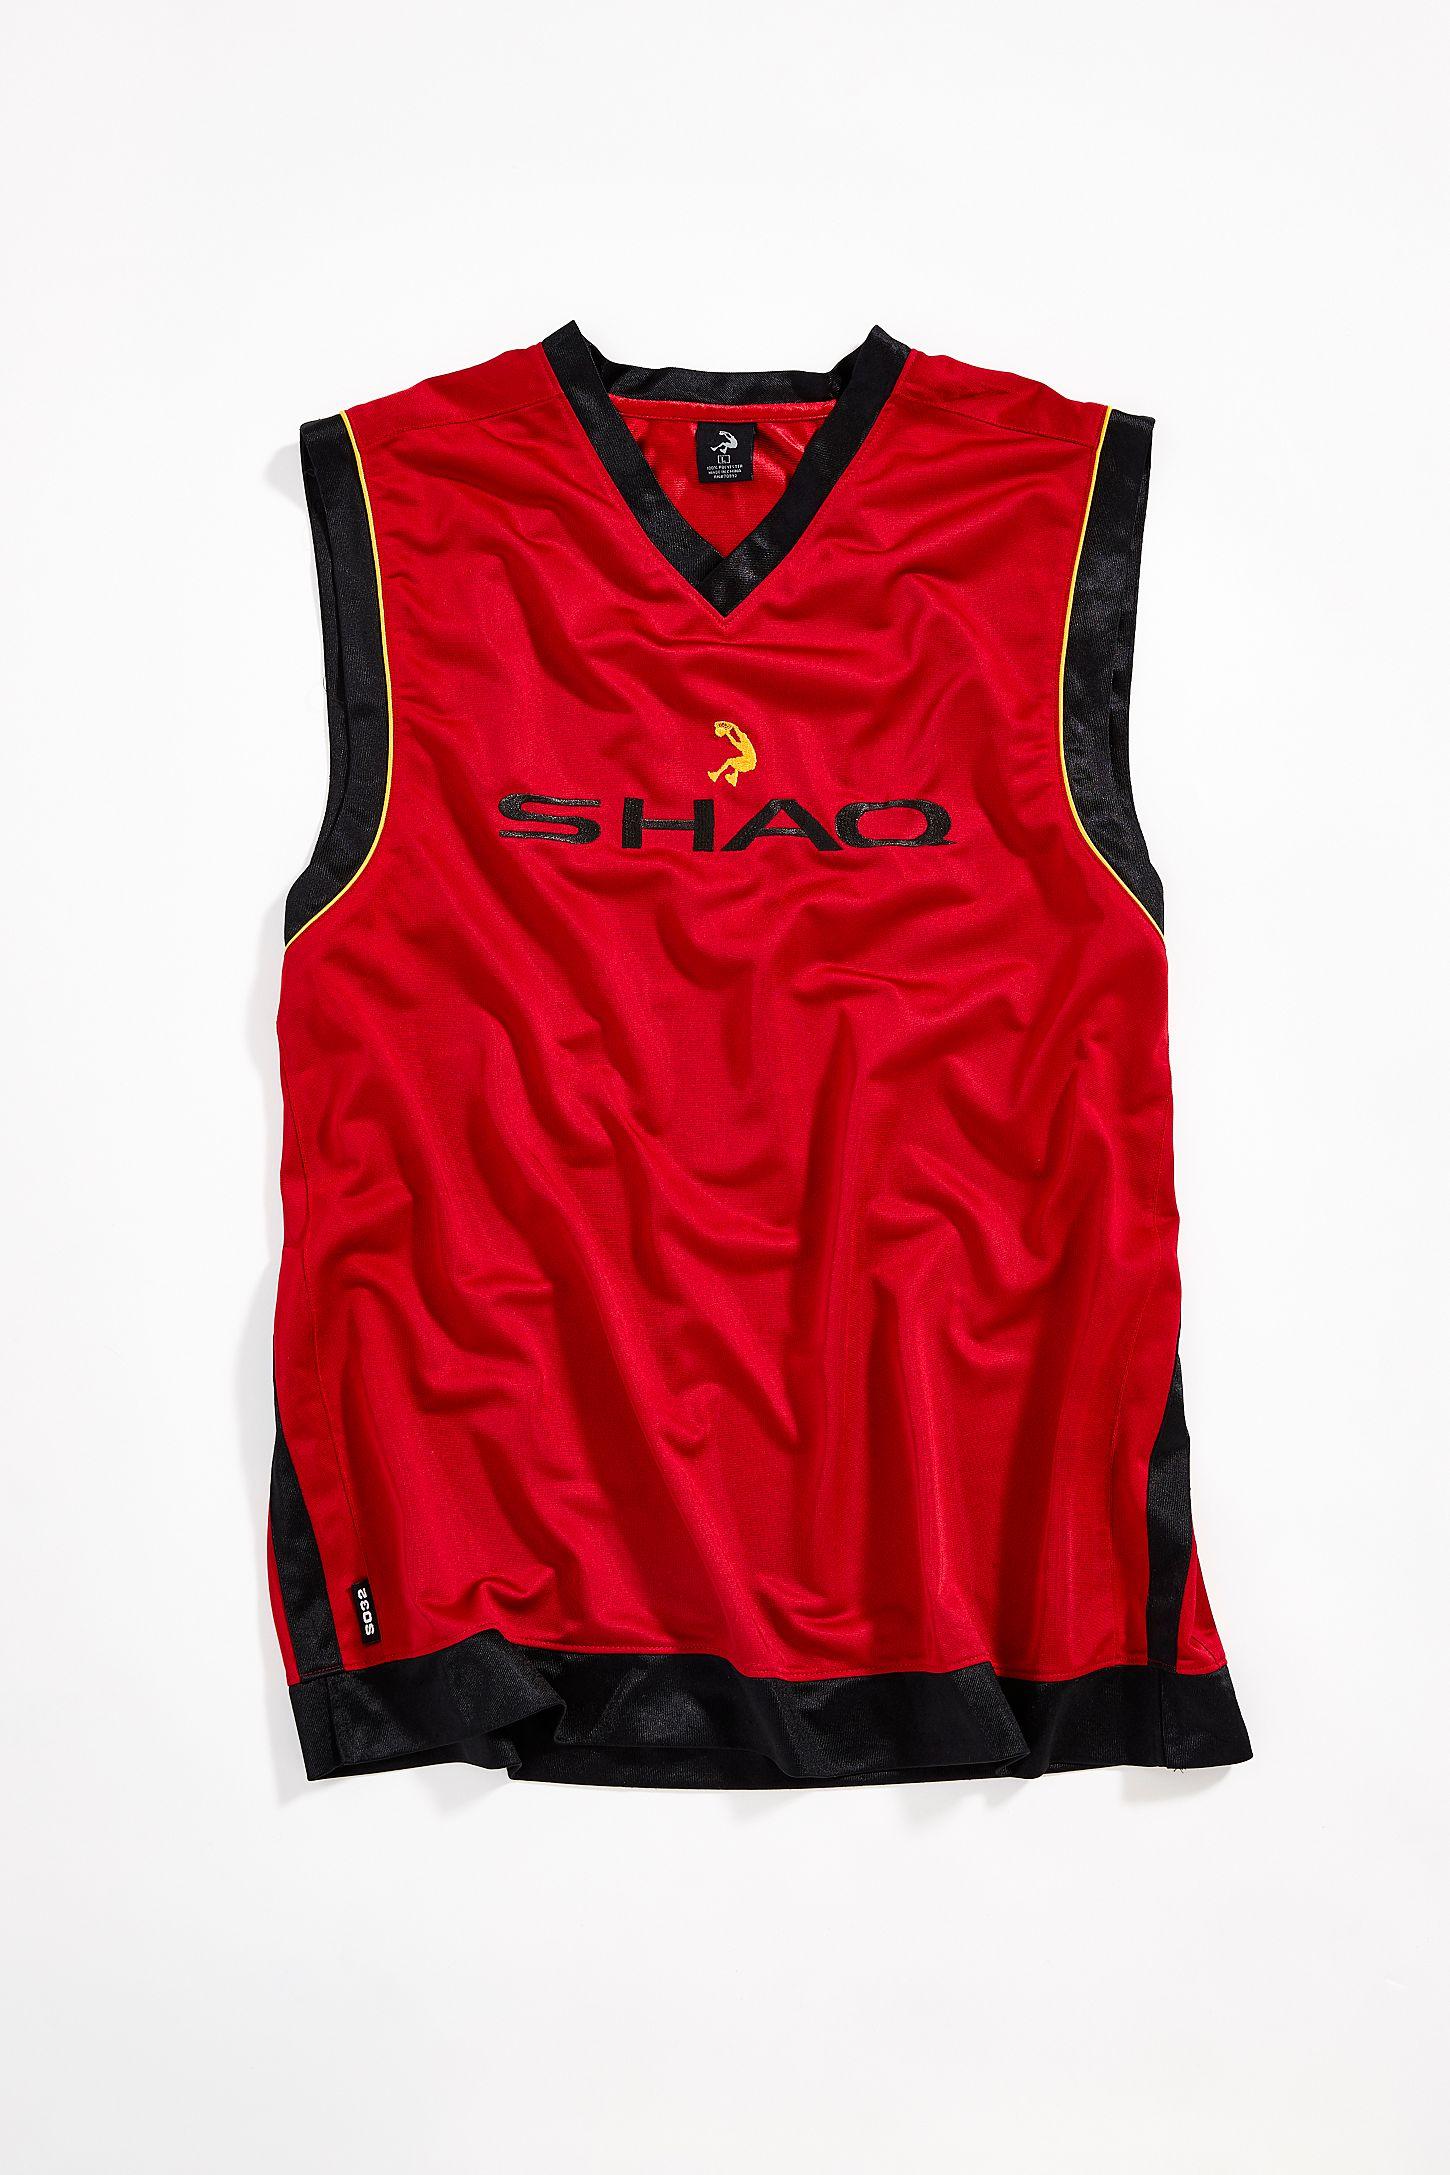 quality design 2e1bf 520b3 Vintage Shaq Brand Basketball Jersey